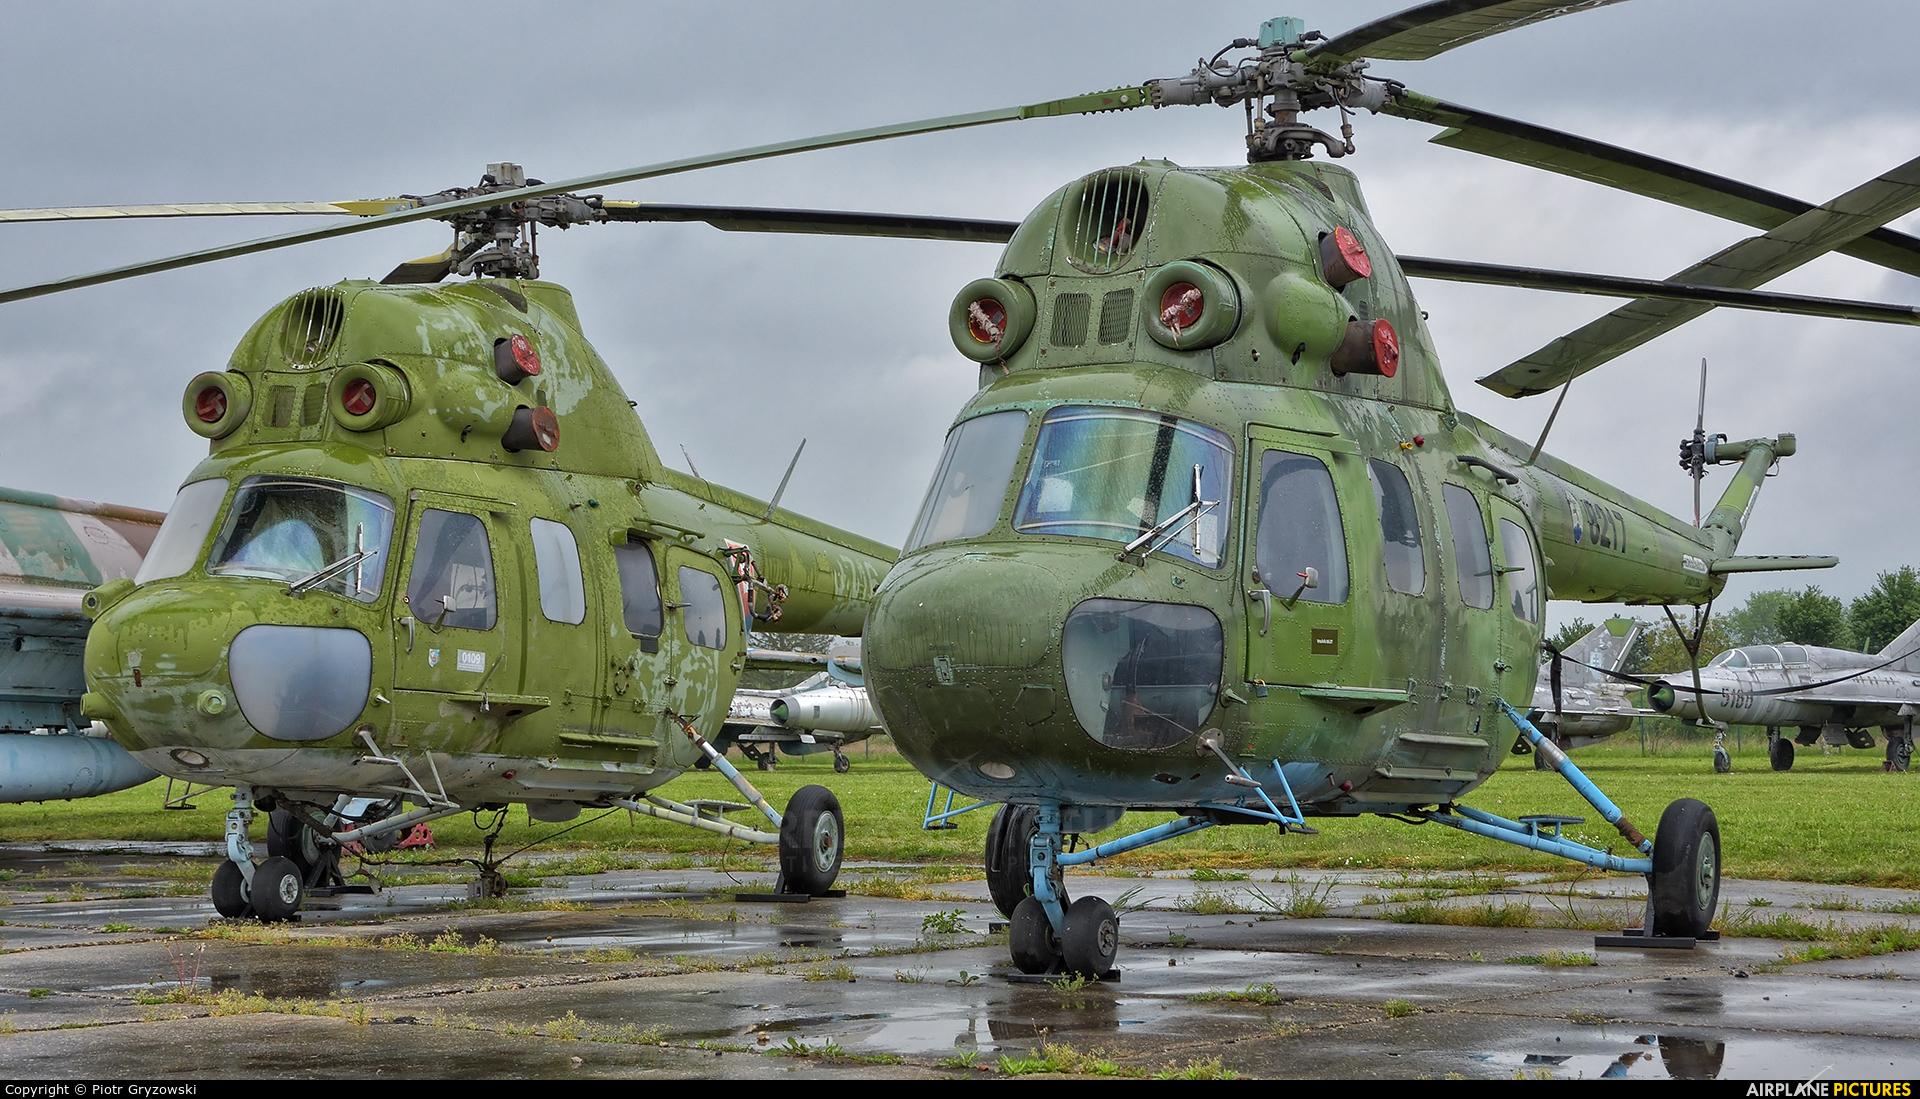 Slovakia -  Air Force 8217 aircraft at Piestany